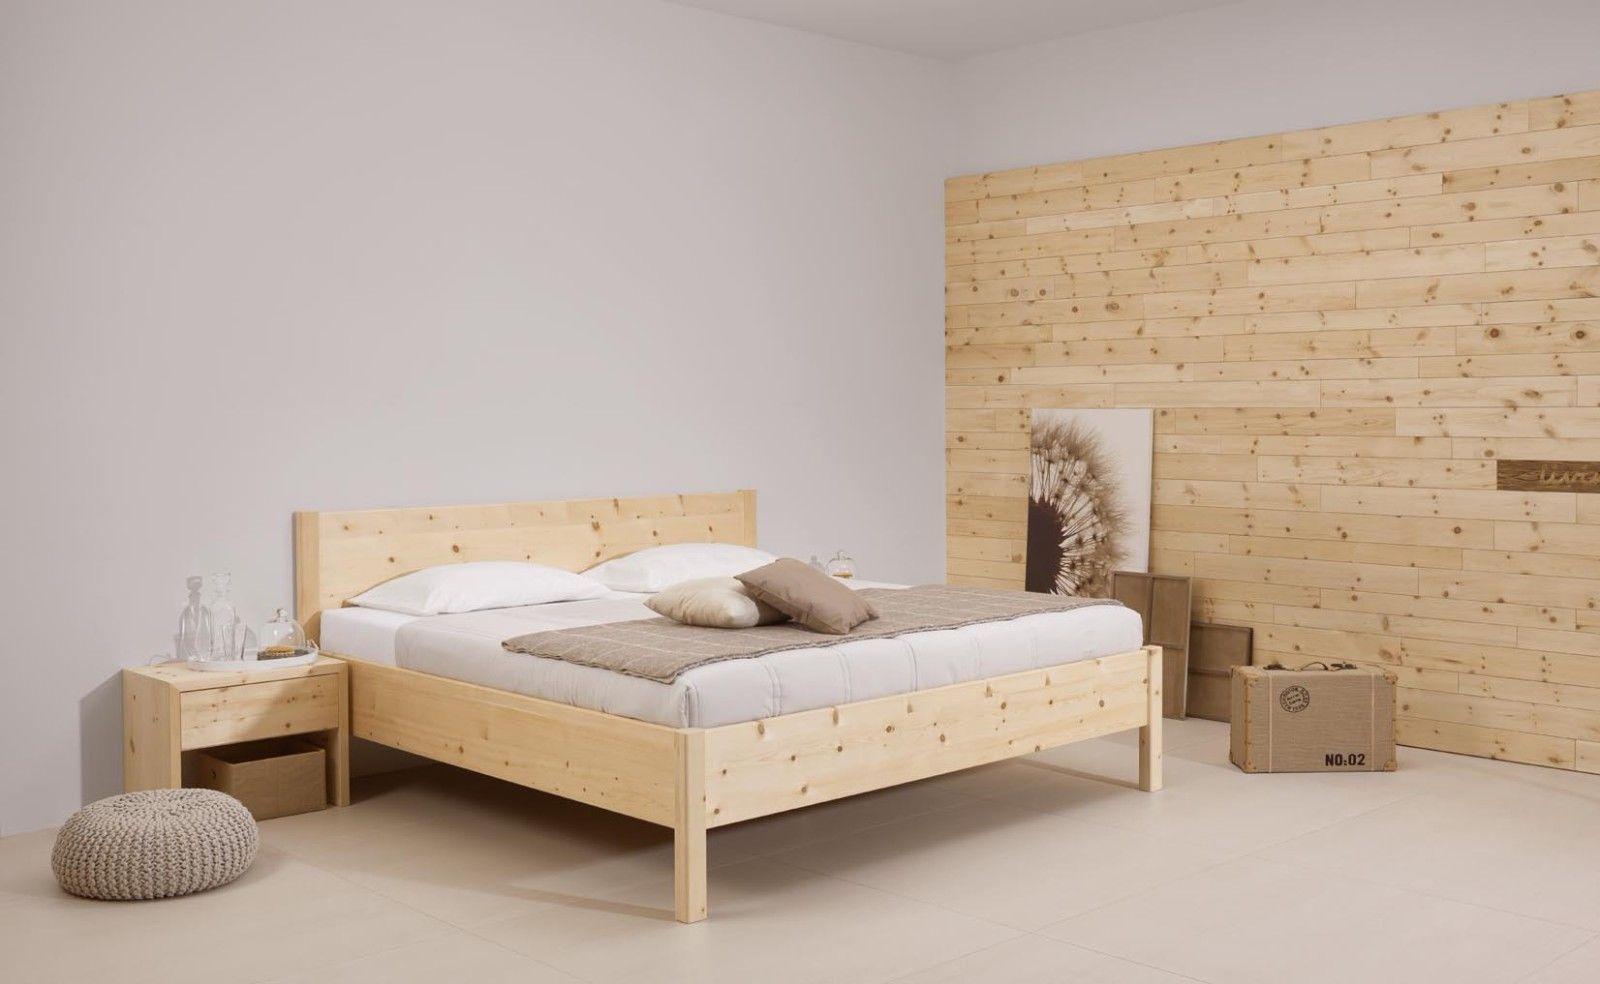 Zirben-Designerbett ZIRBENPARADIES Bettanlage   Zirbenbetten  Betten ...